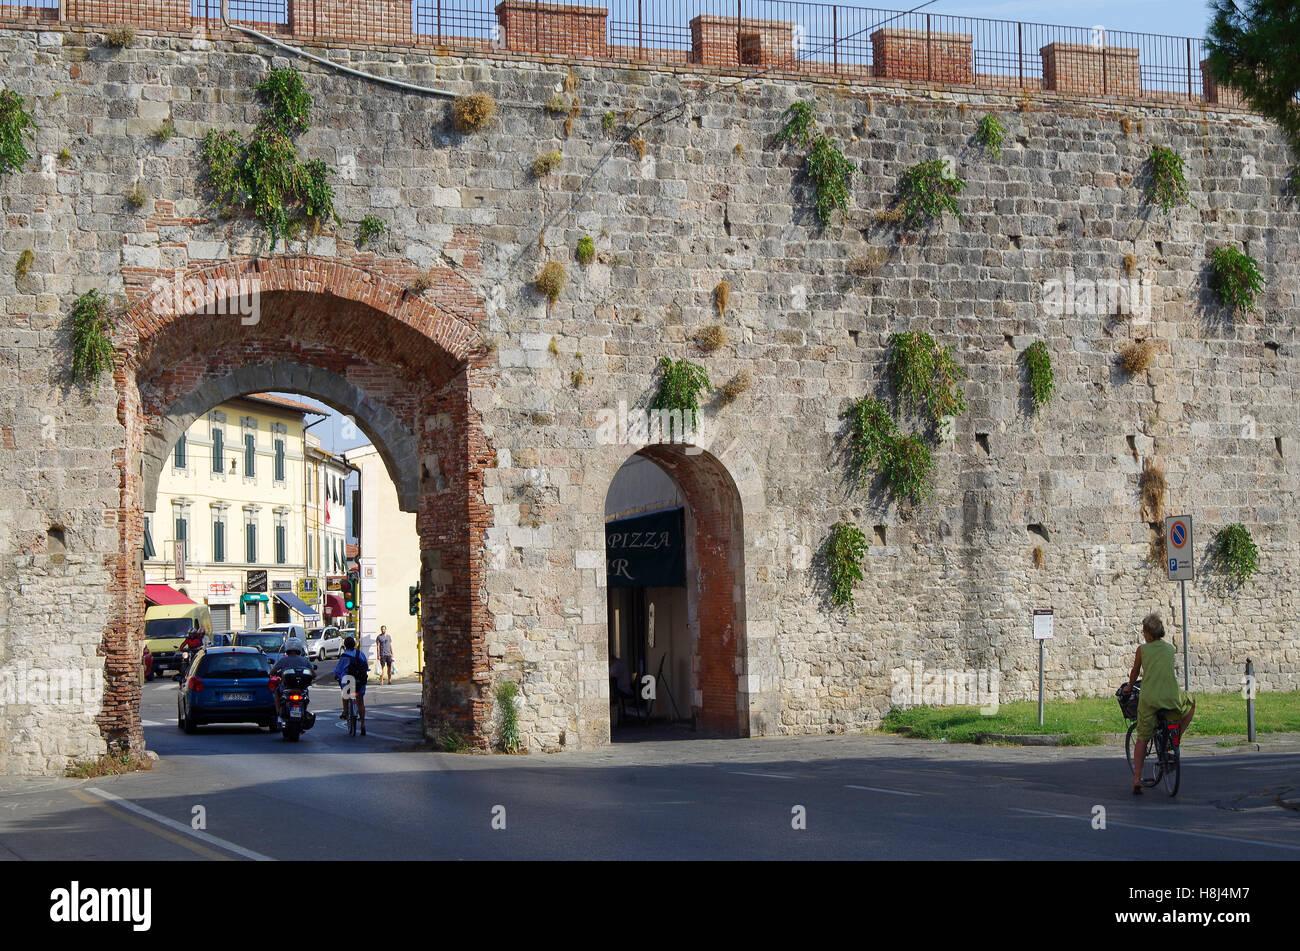 City Wall Pisa Stock Photos Amp City Wall Pisa Stock Images